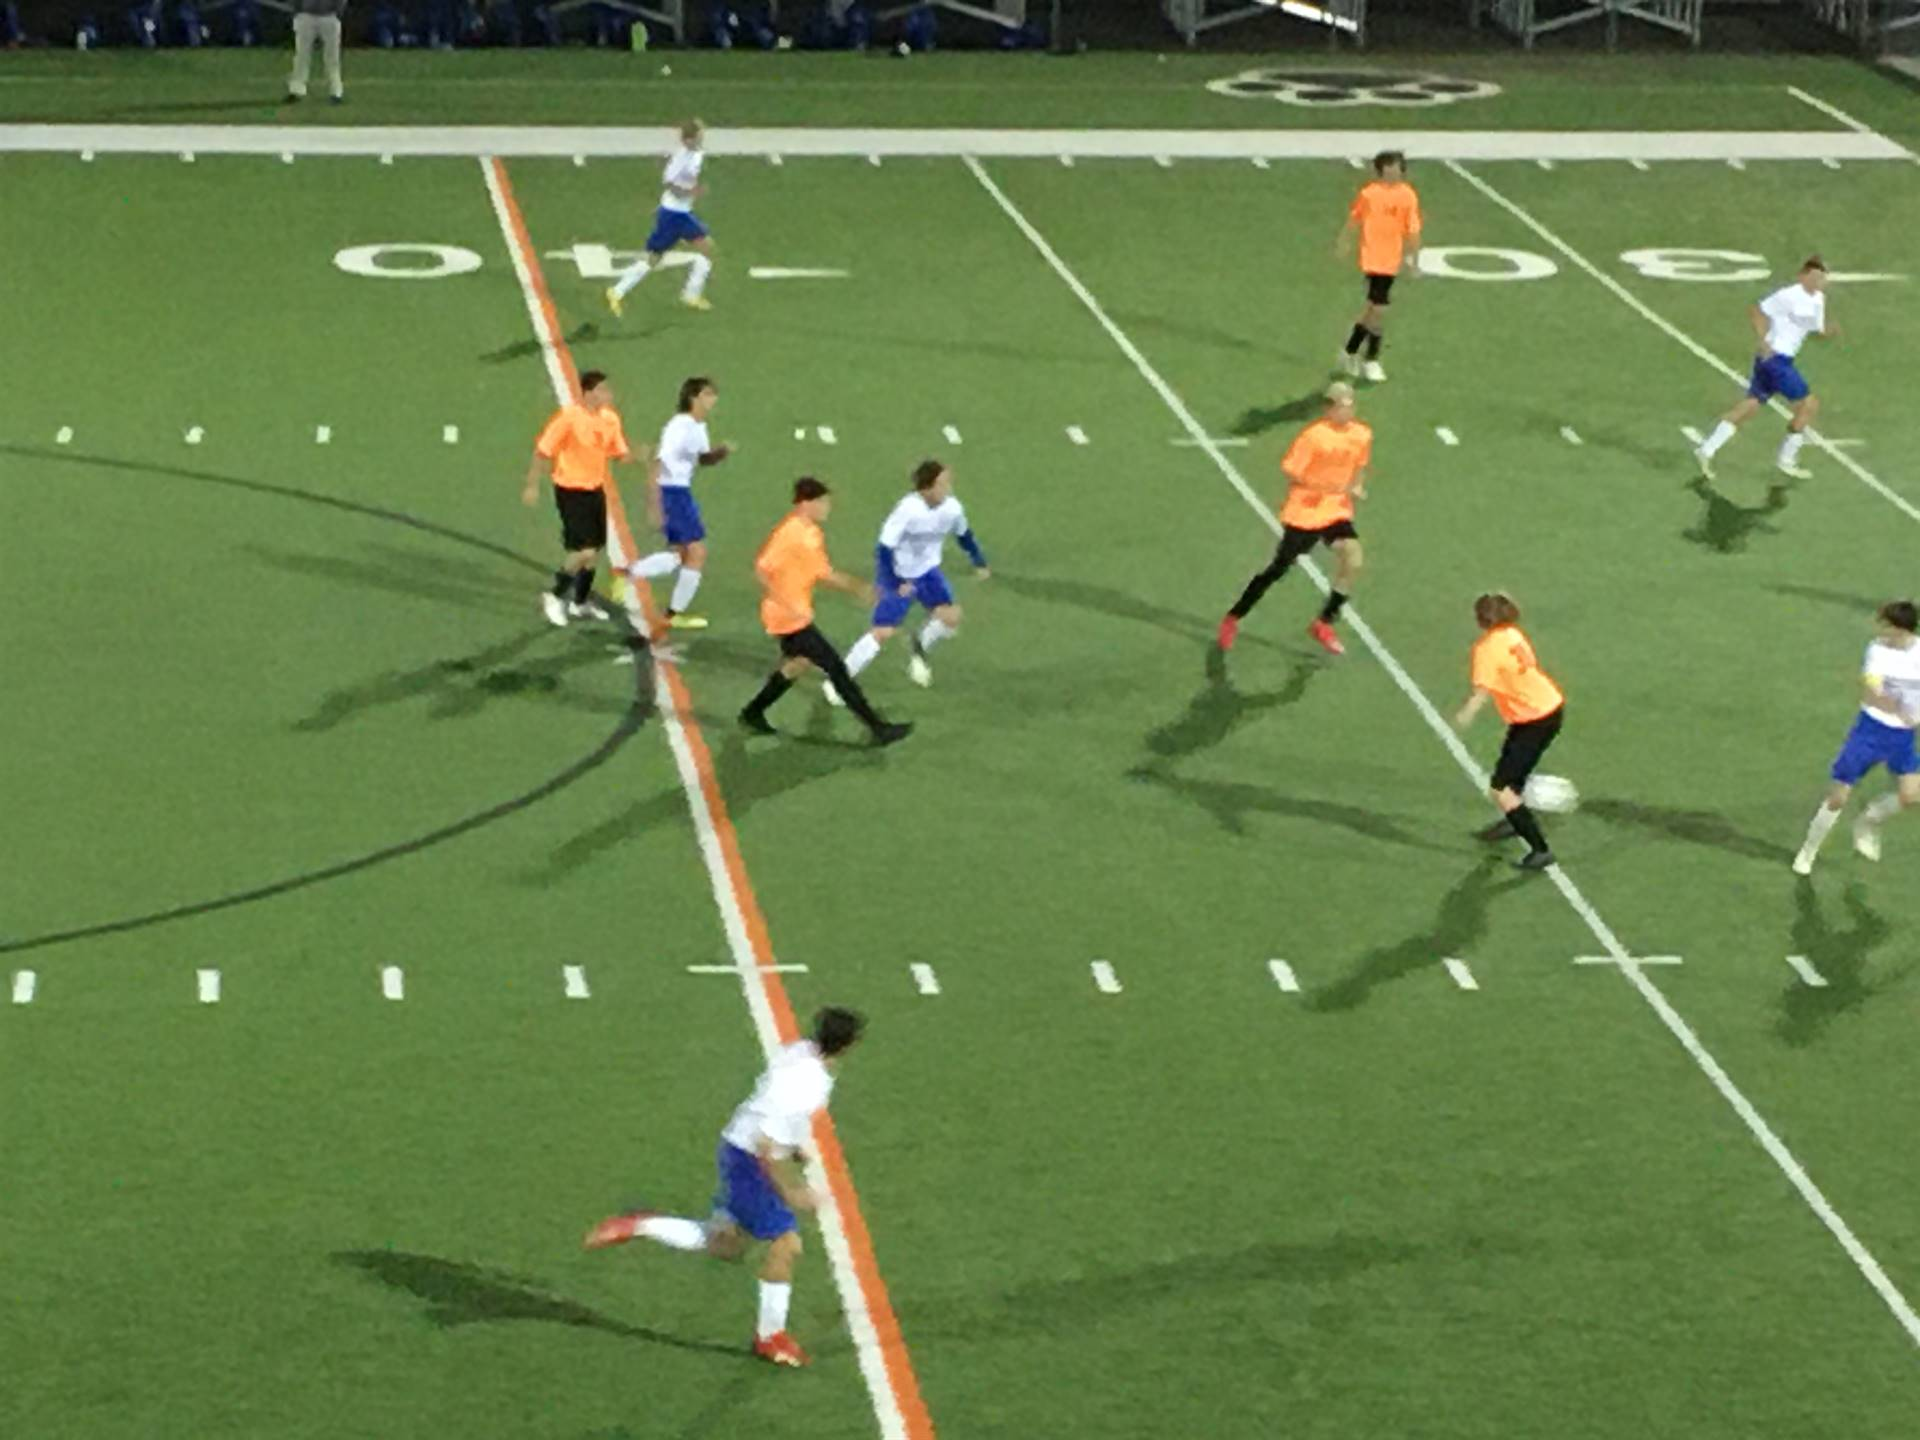 Boys Varsity Soccer taking on Philo at Home